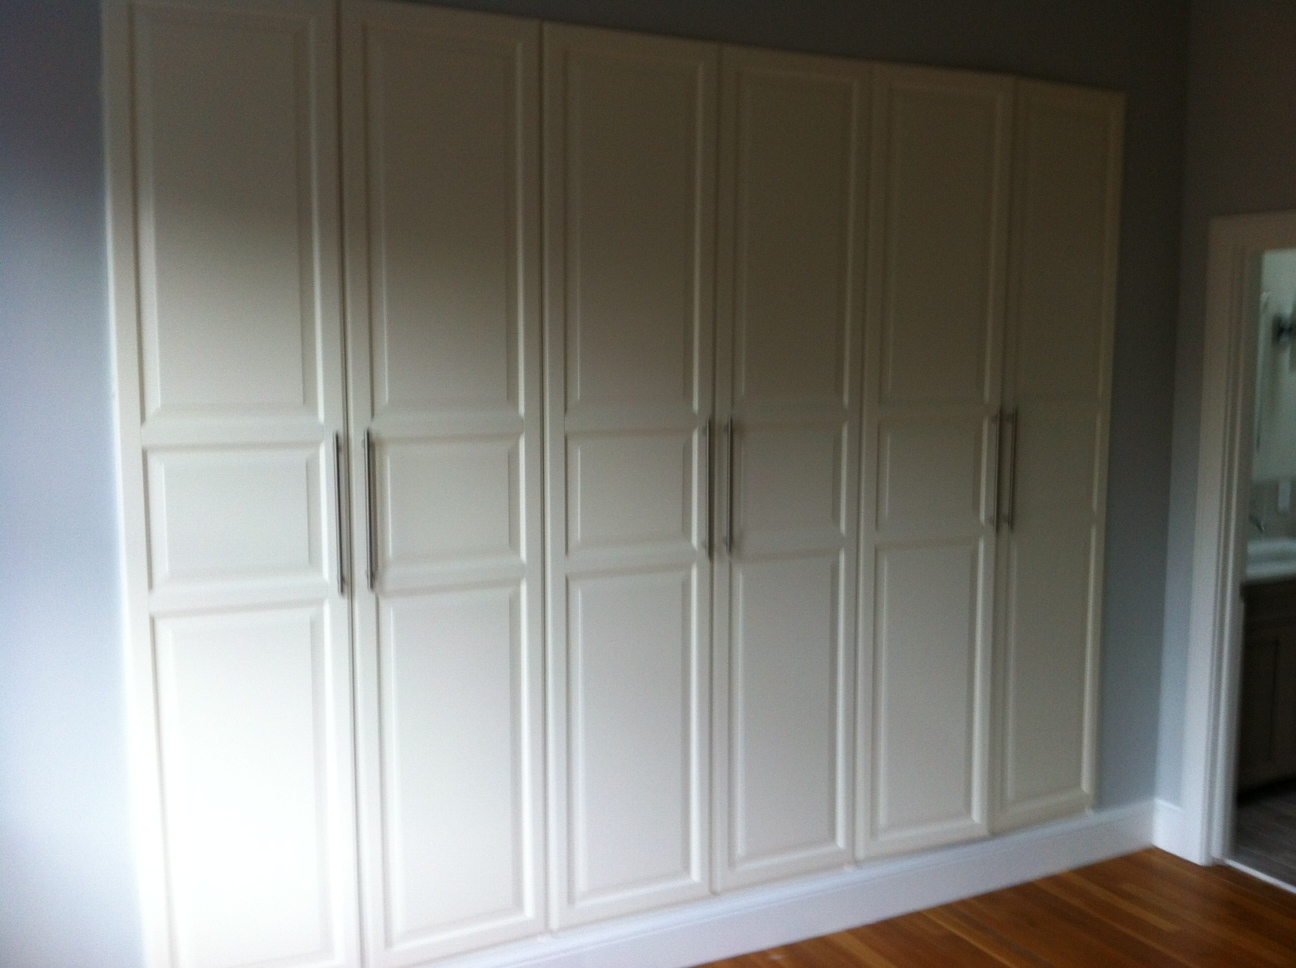 Pax Built-Ins (The Tall Doors!)